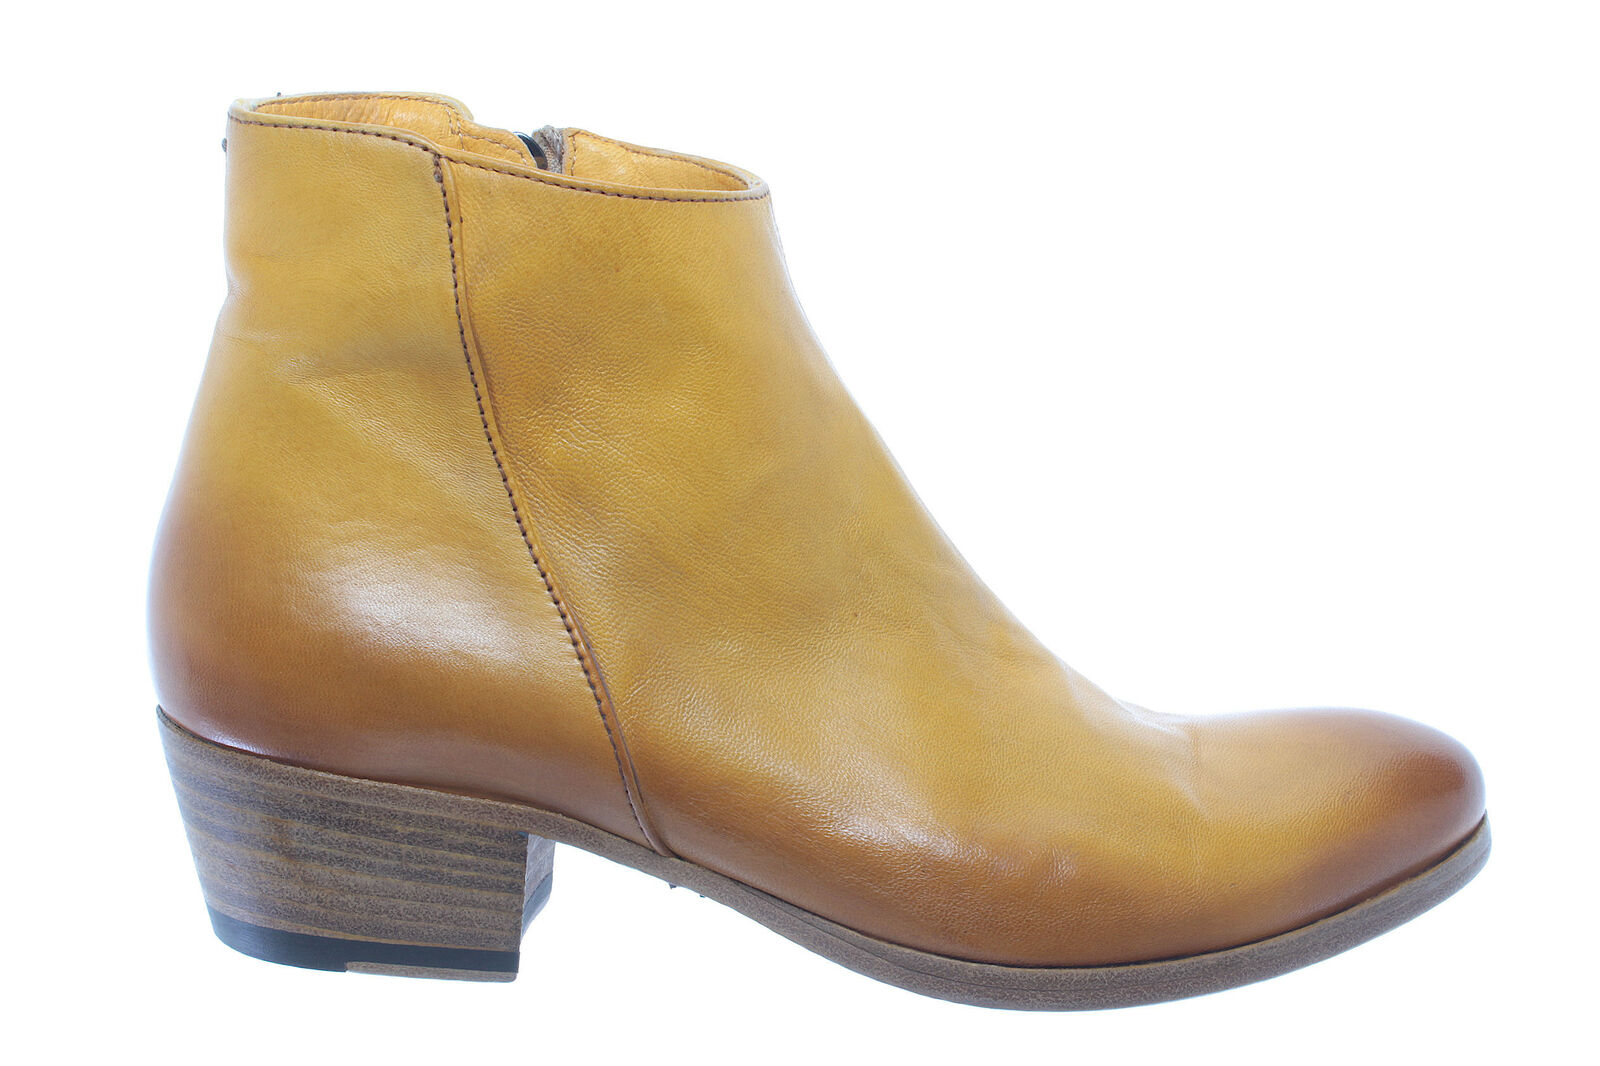 Leder 12160D PANTANETTI Gelb Schuhe Neu Italien Stiefeletten